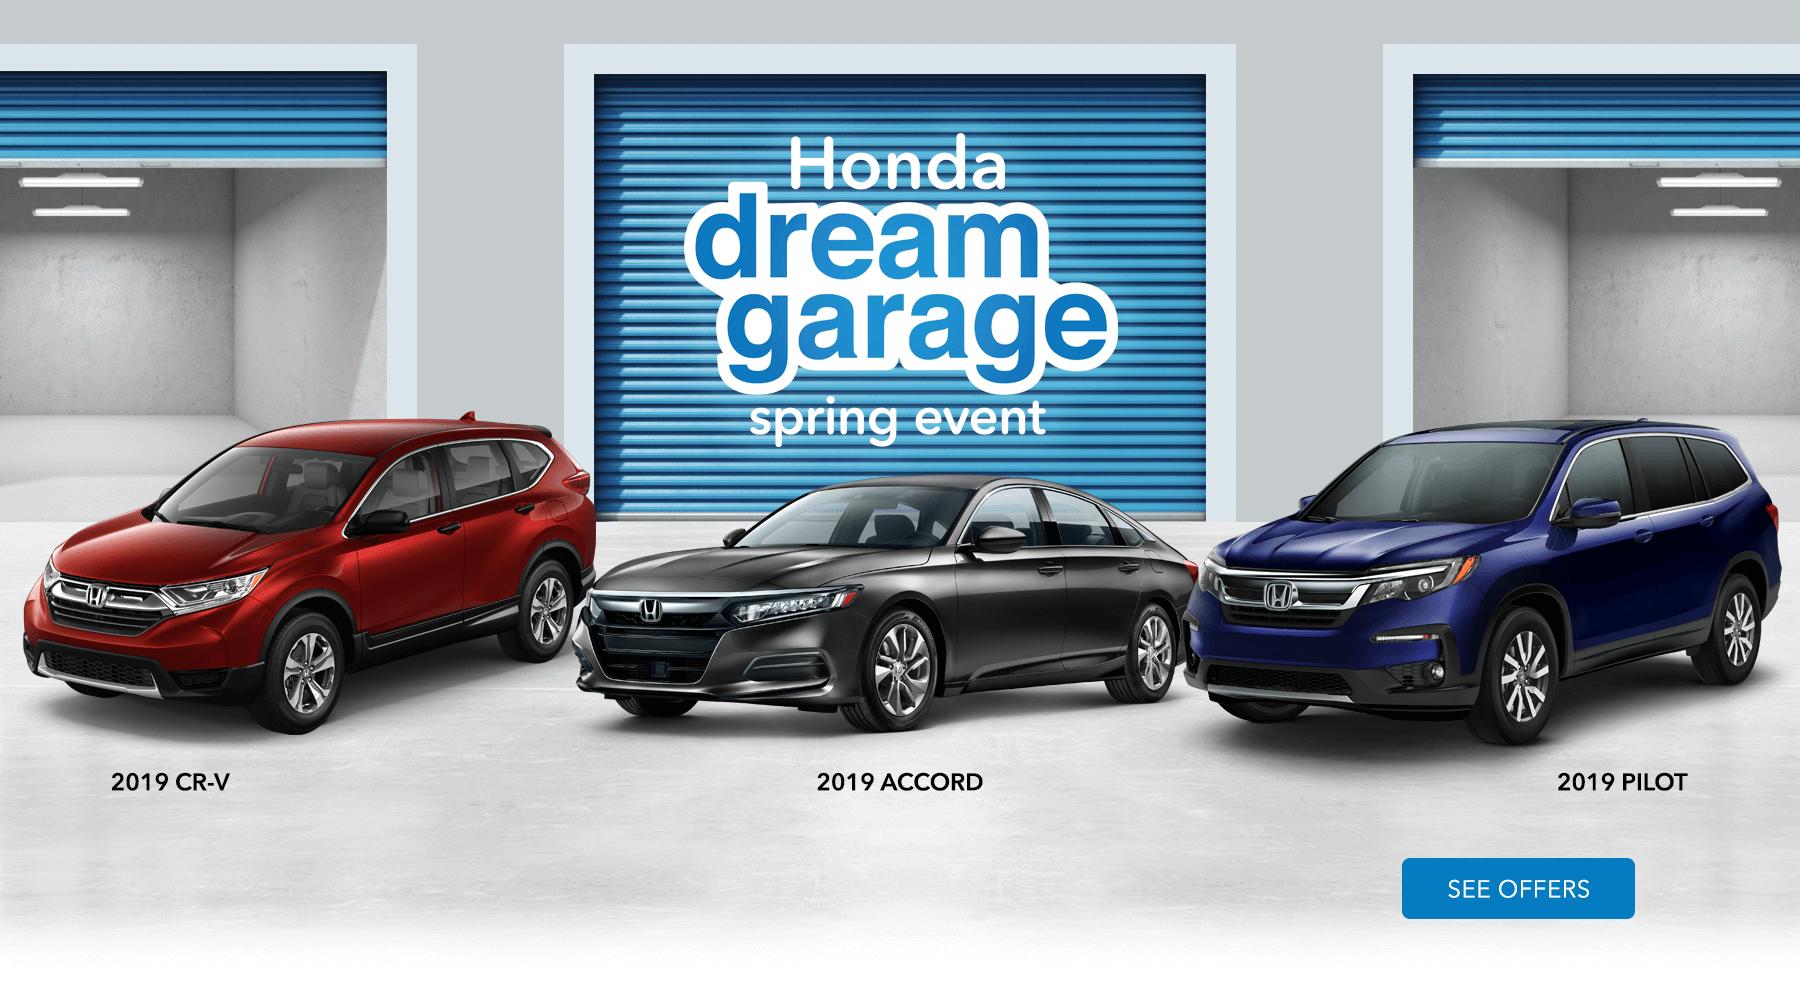 Hawaii Honda Dealers 2019 Honda Dream Garage HP Slide